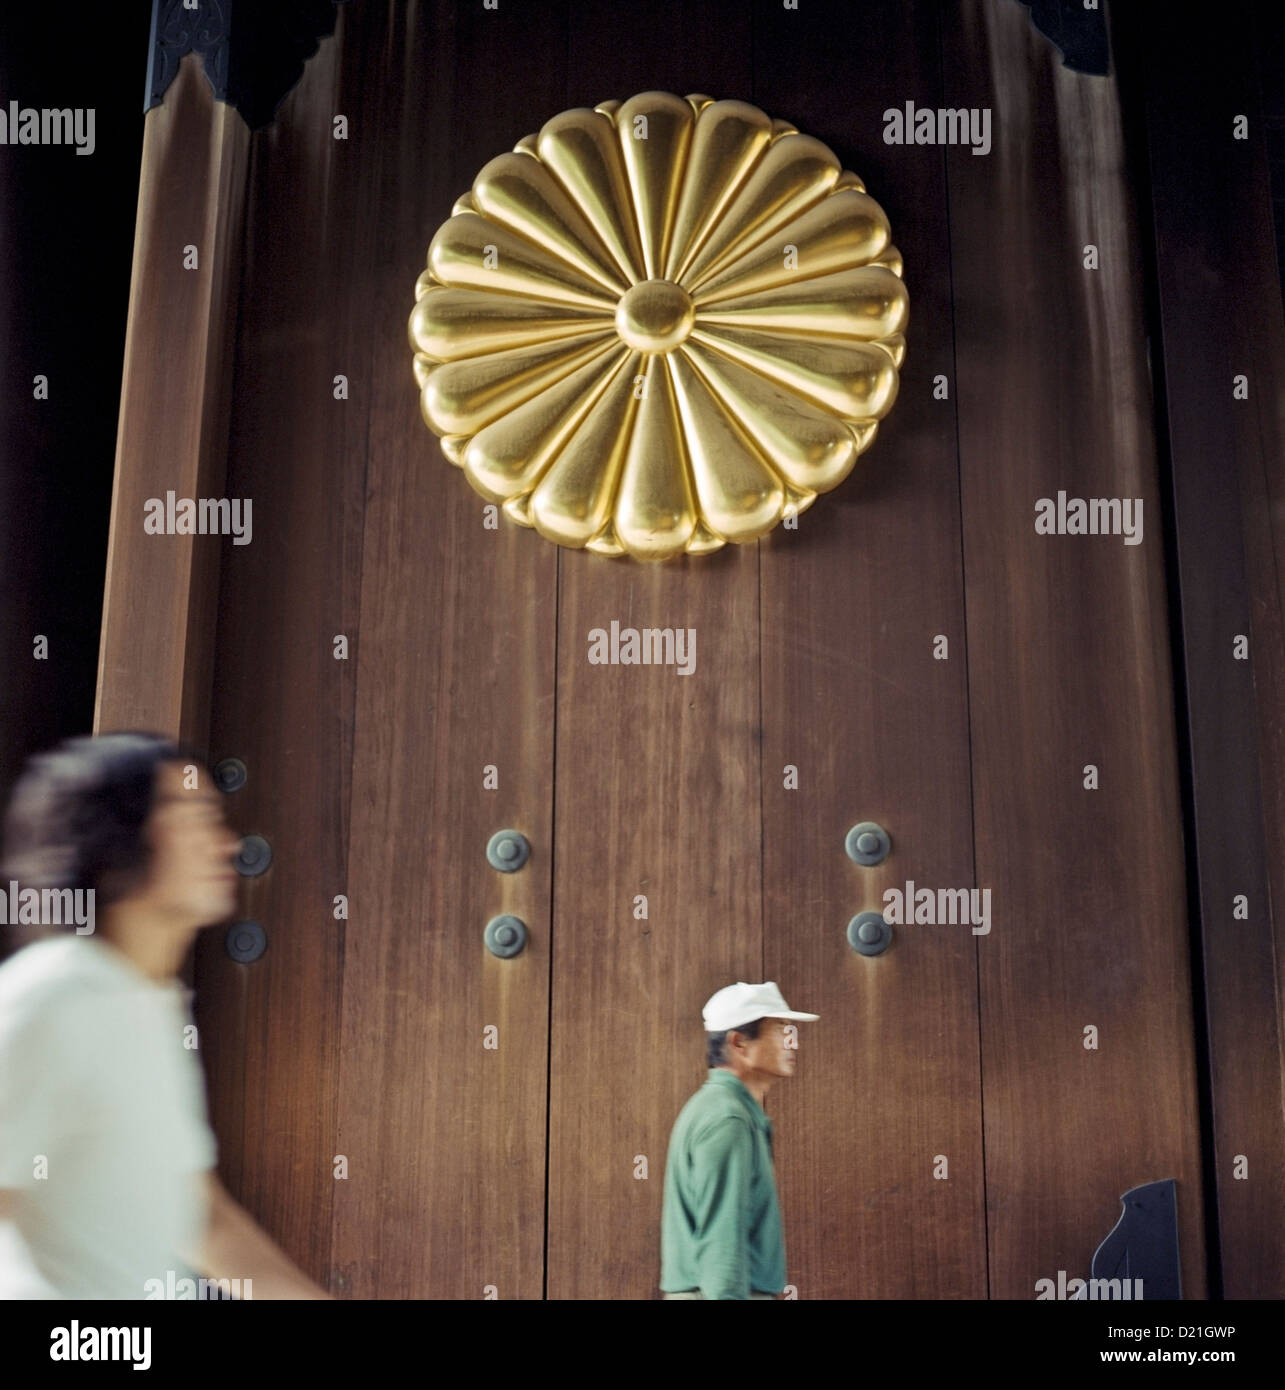 Visitors enter through the main gate at the Yasukuni Shrine in Tokyo, Japan - Stock Image